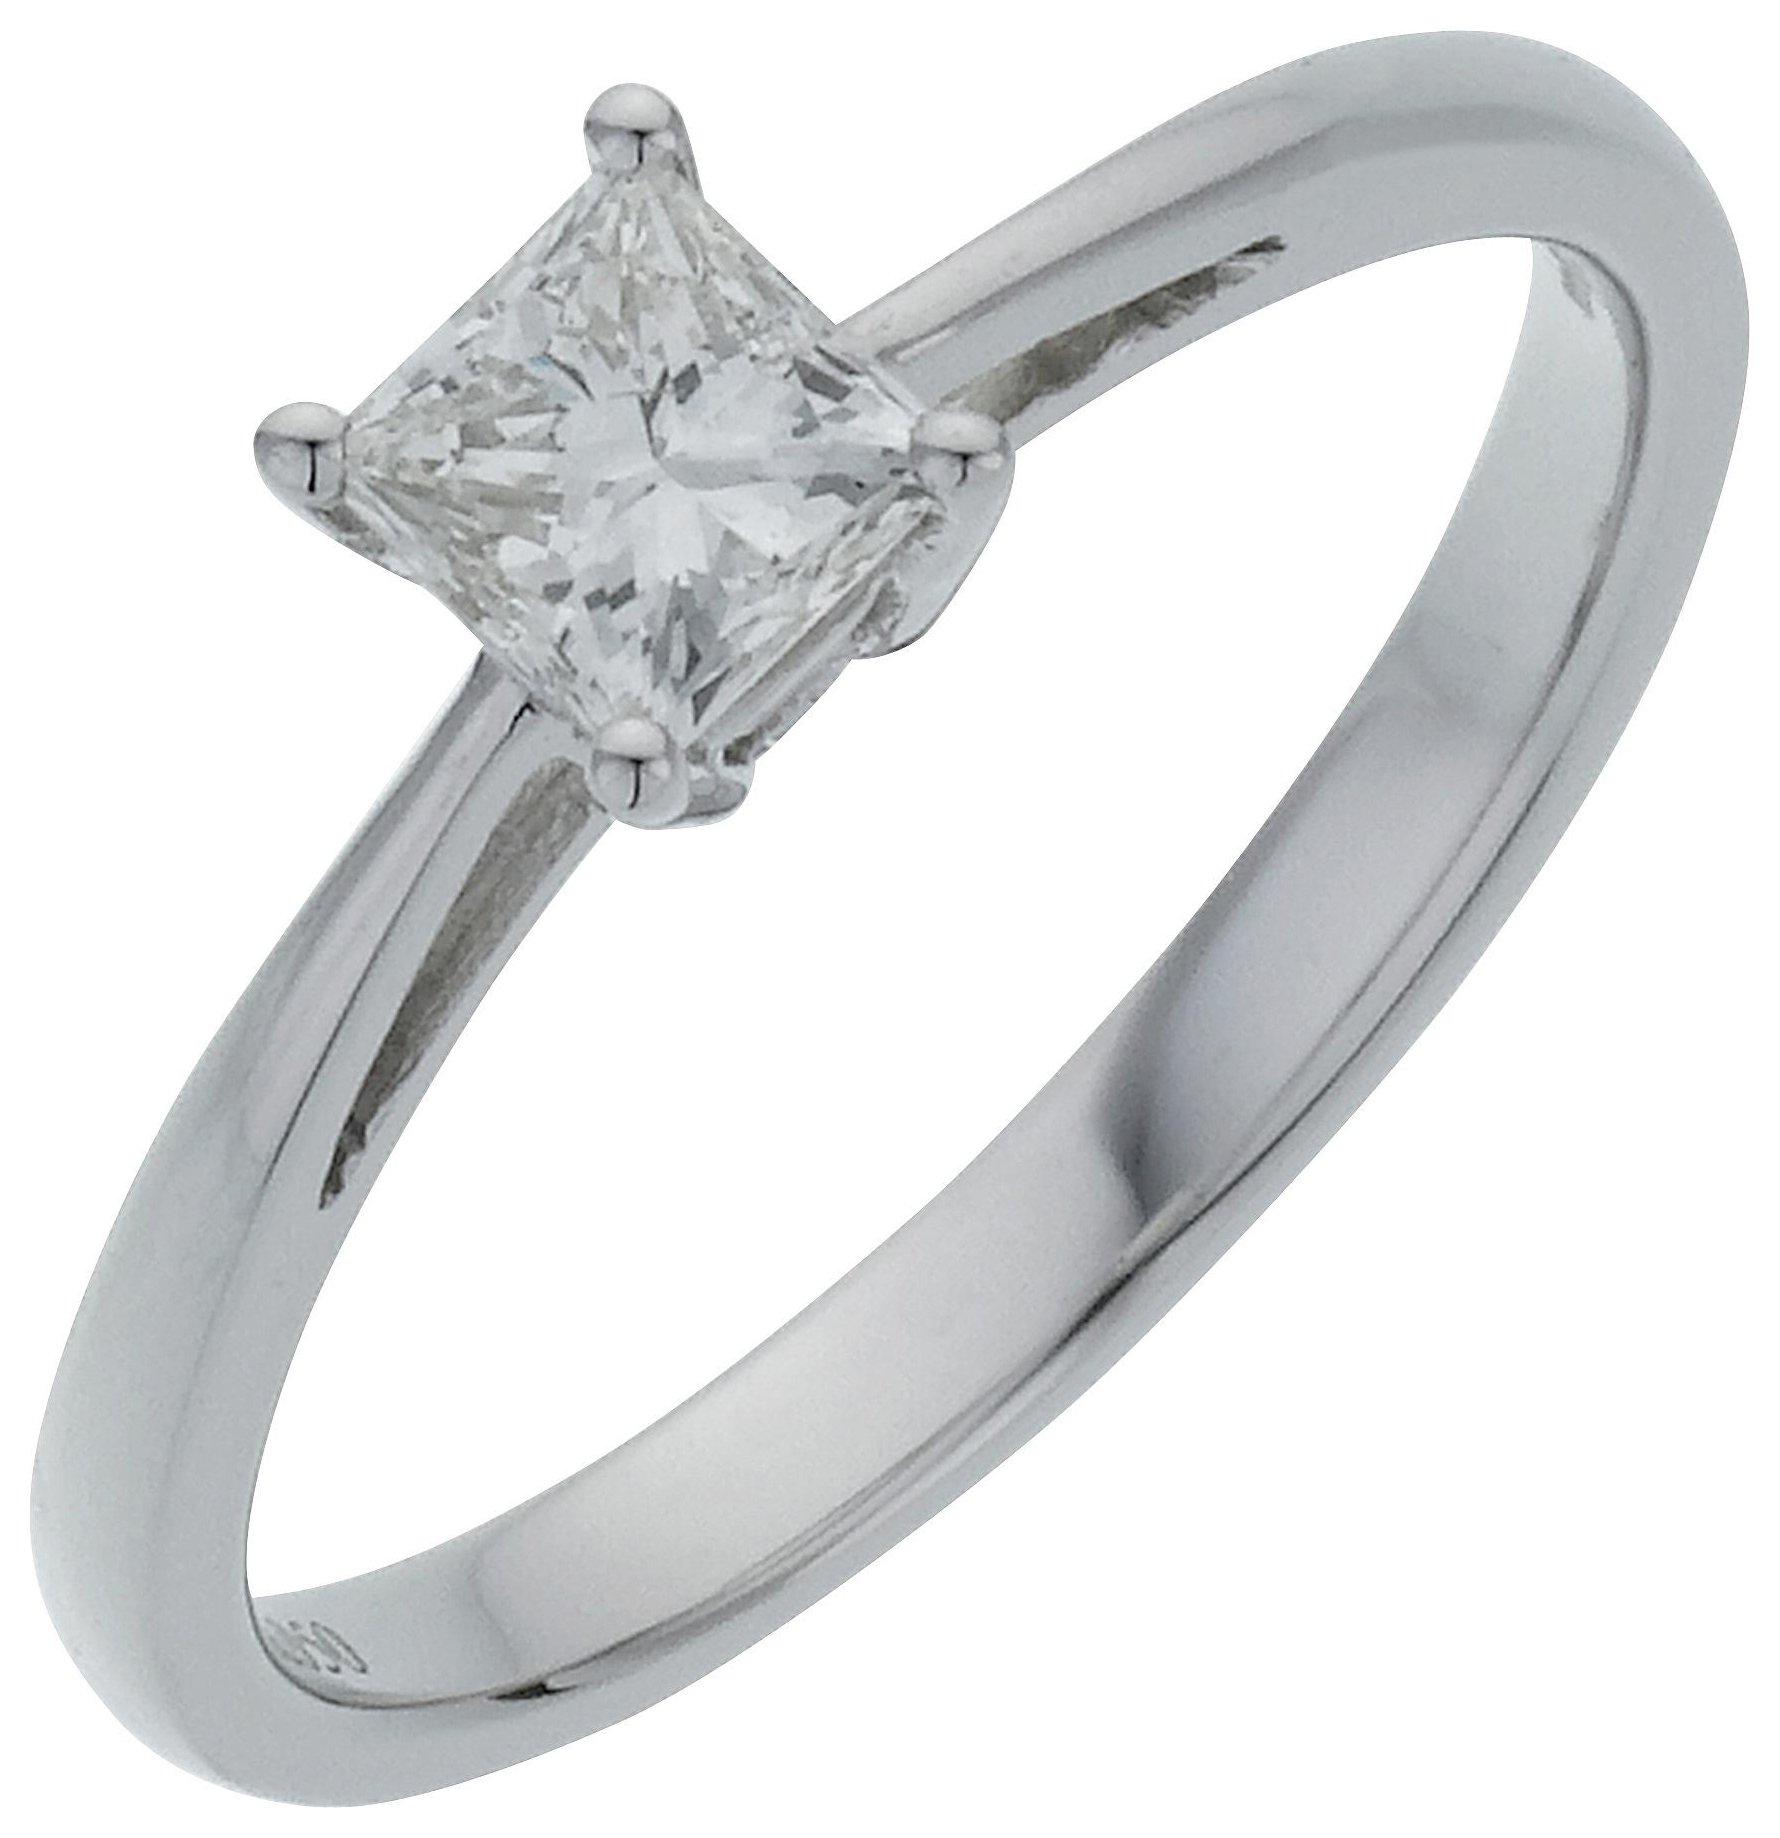 18 Carat White Gold 05 Carat Diamond - Princess Cut Diamond - Ring - J